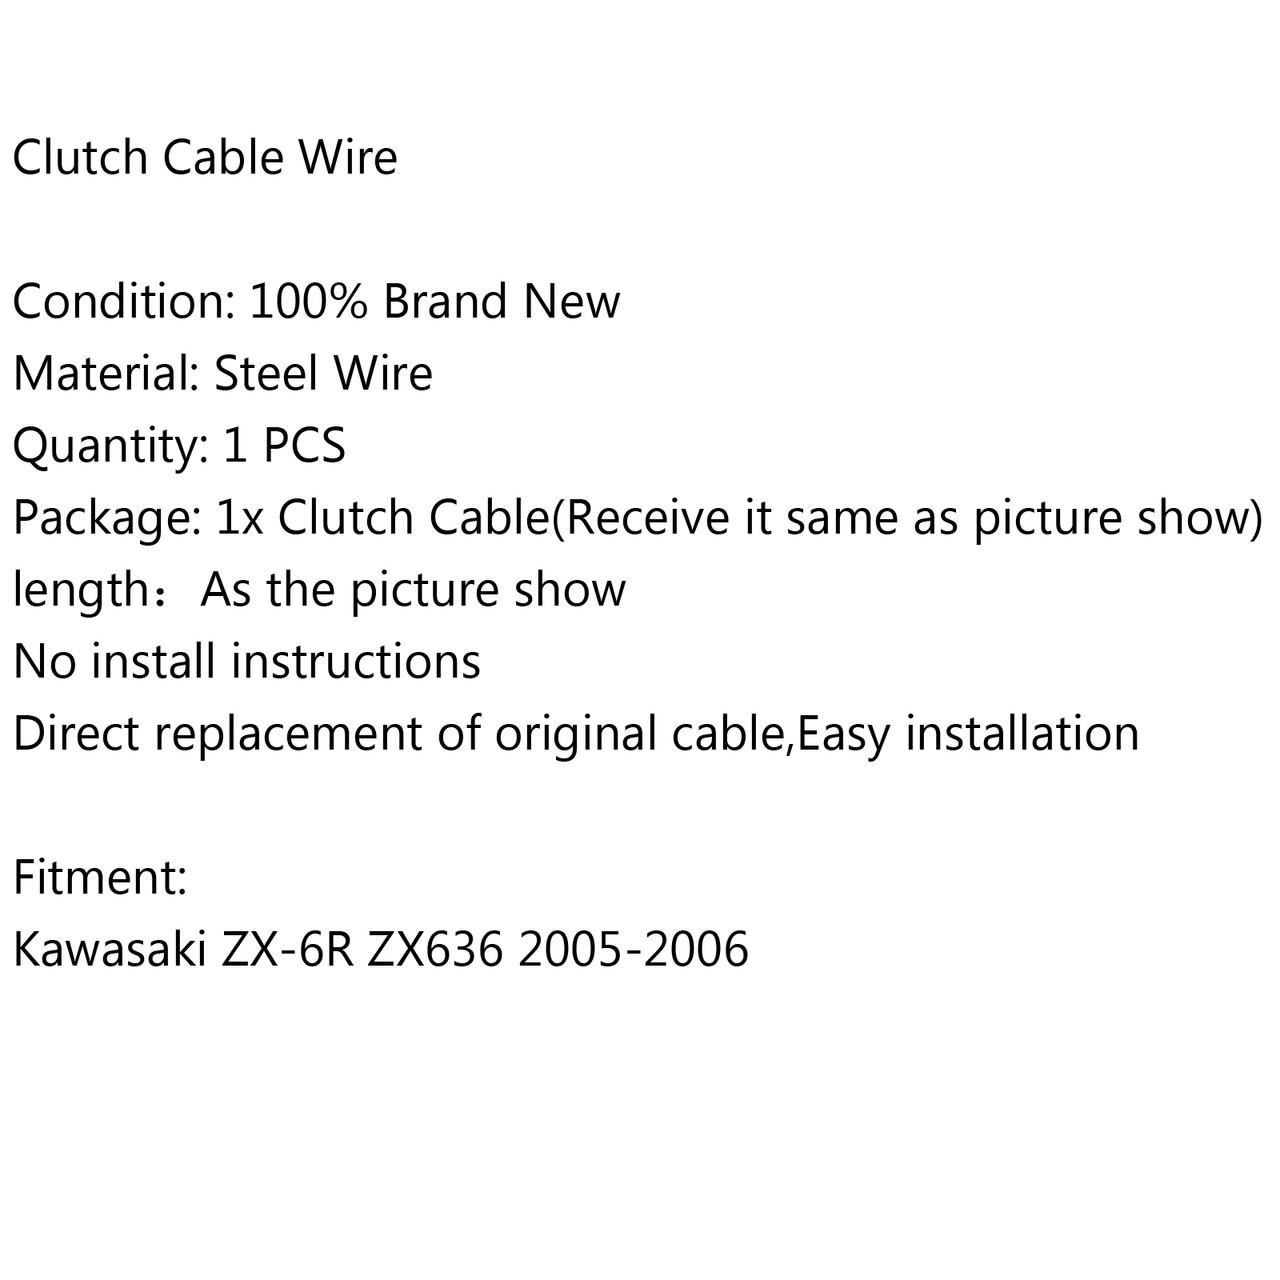 Clutch Cable Wire Steel Braided Kawasaki ZX-6R ZX636 (2005-2006)